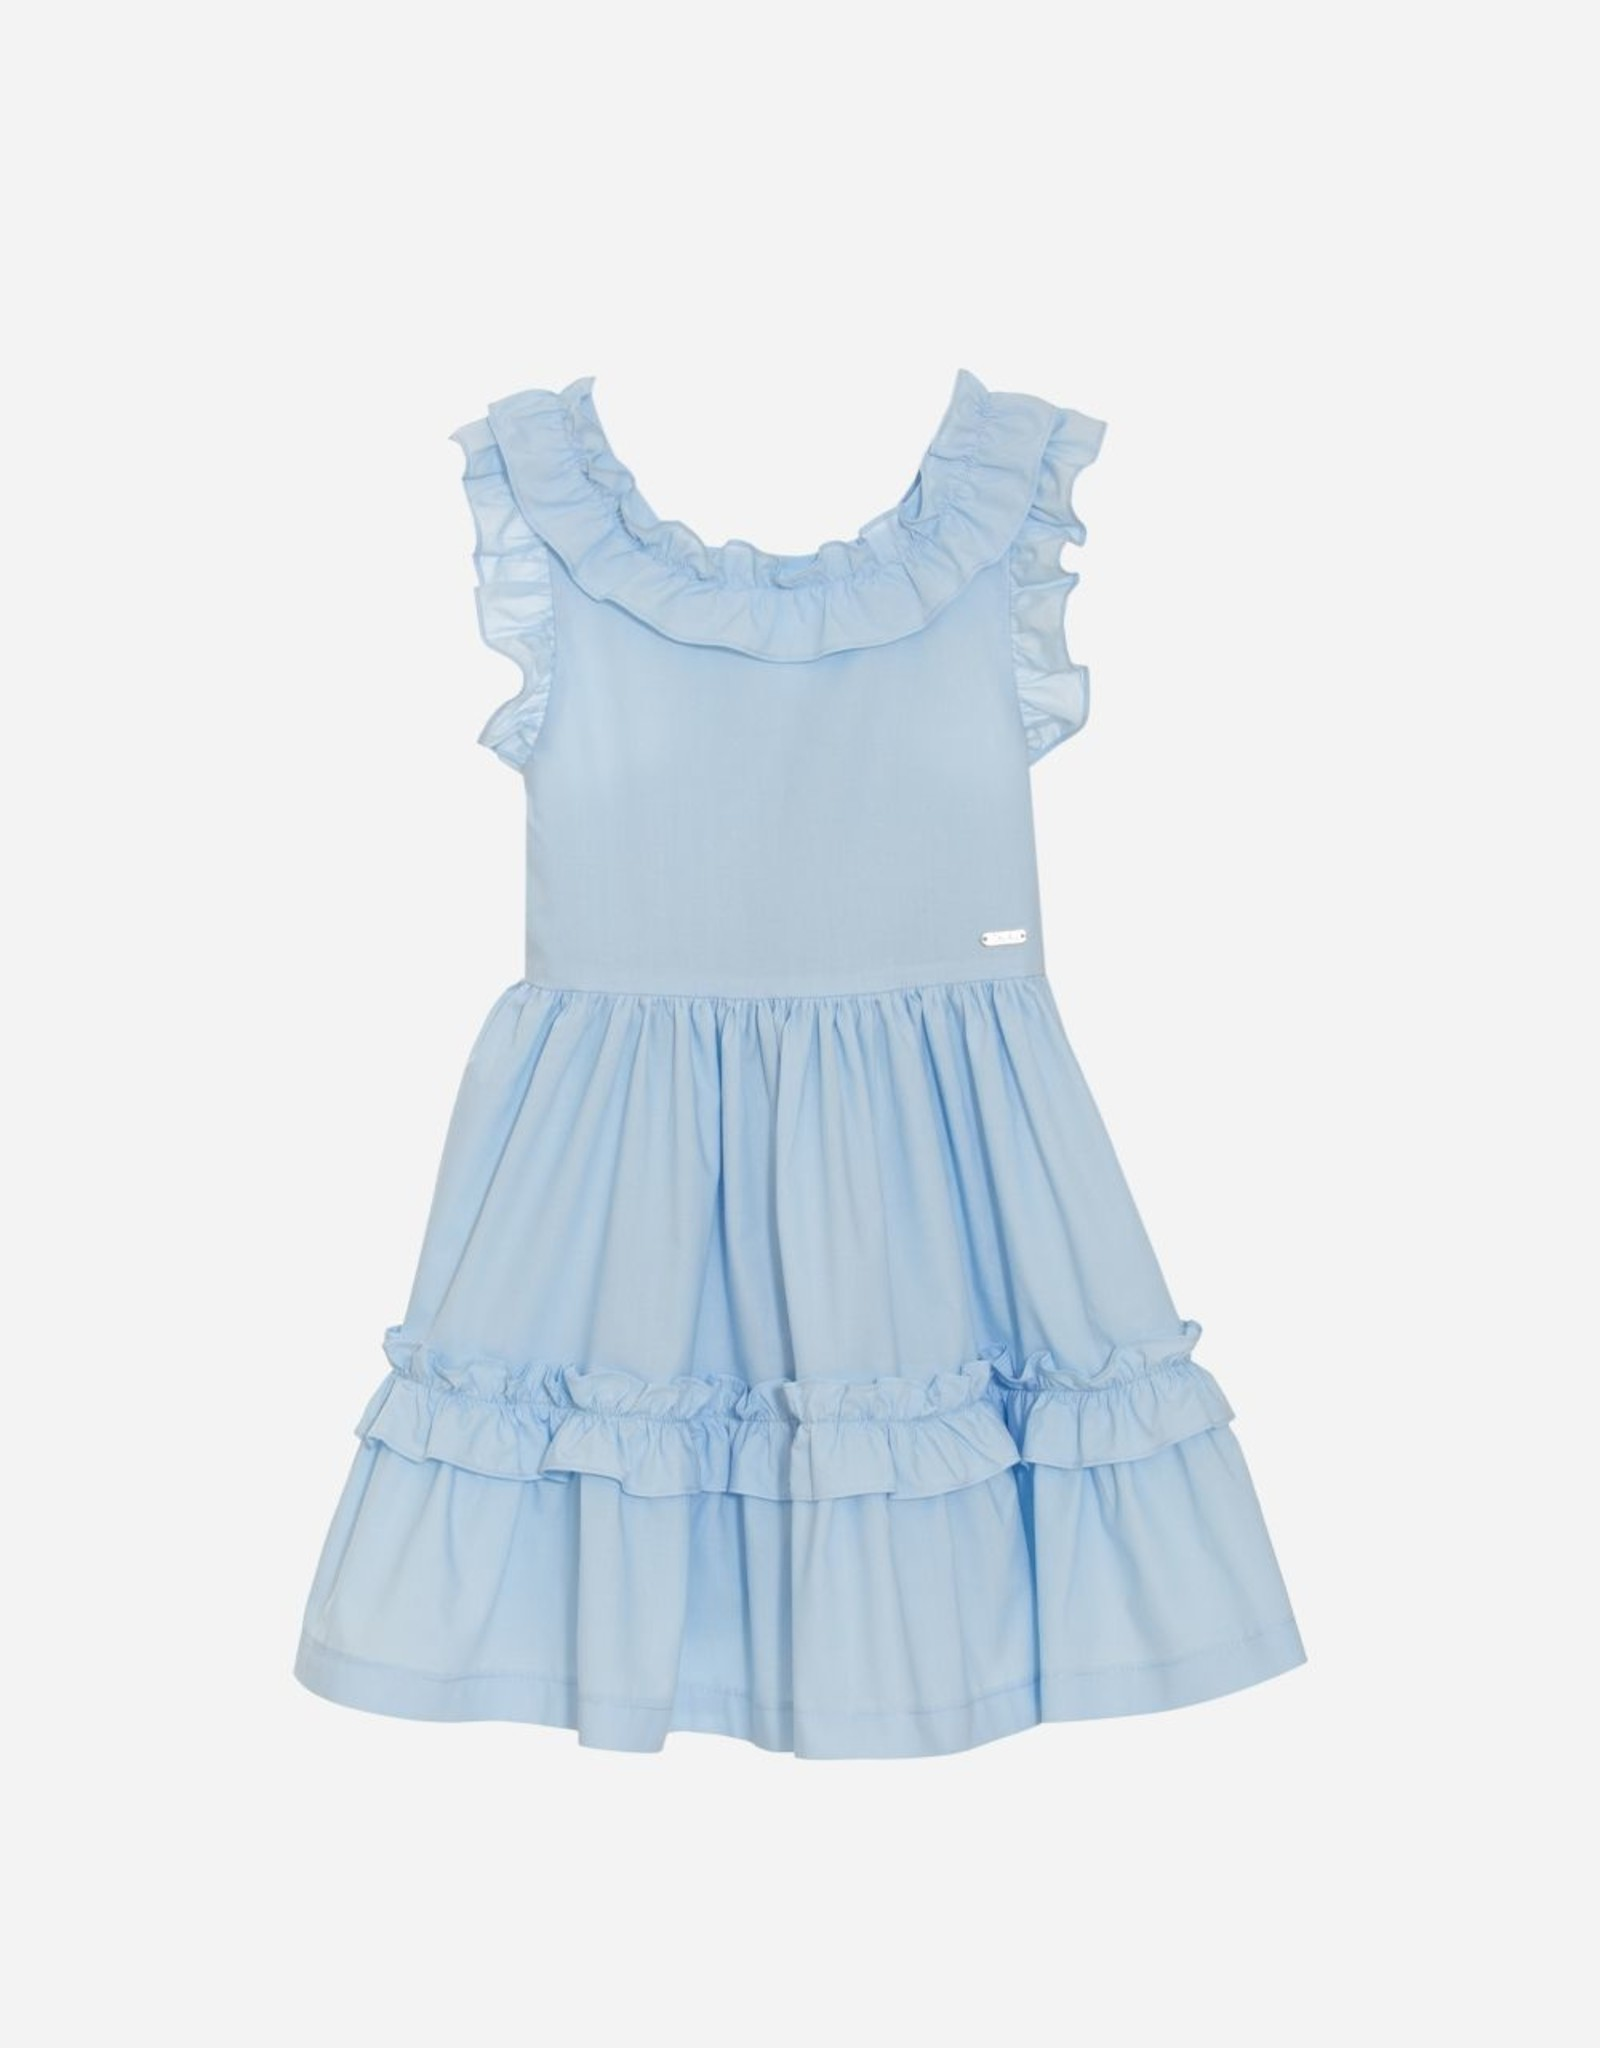 PATACHOU PATACHOU dress blue